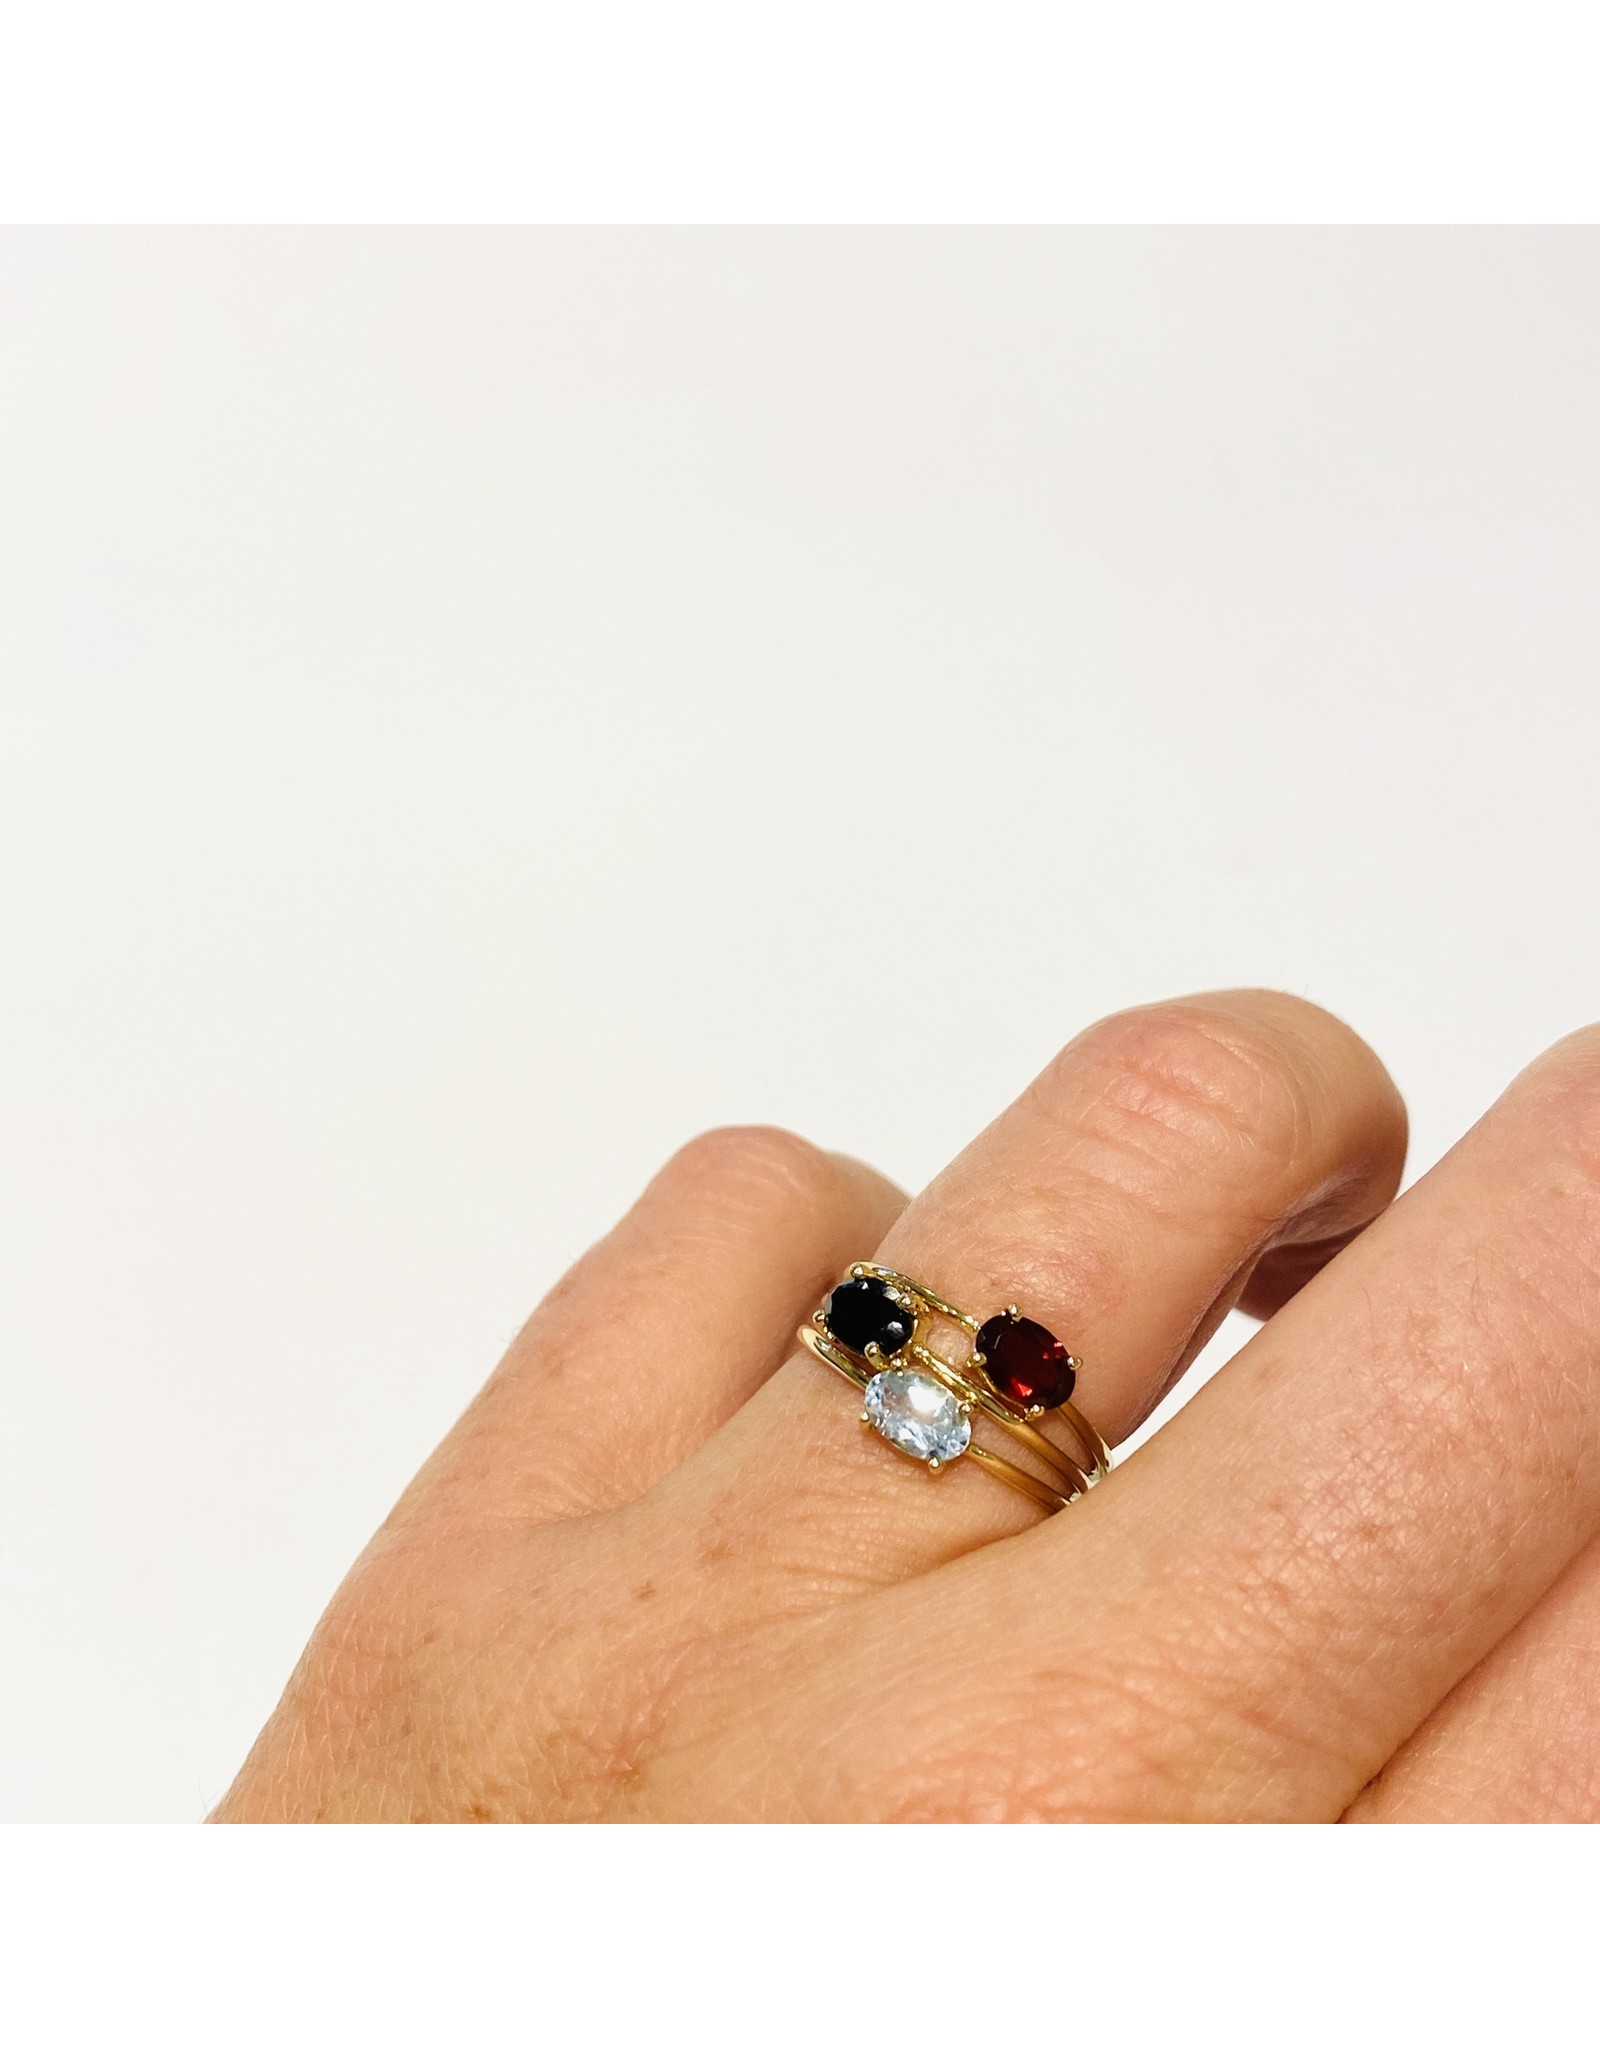 Bo Gold Ring - Gold - Garnet